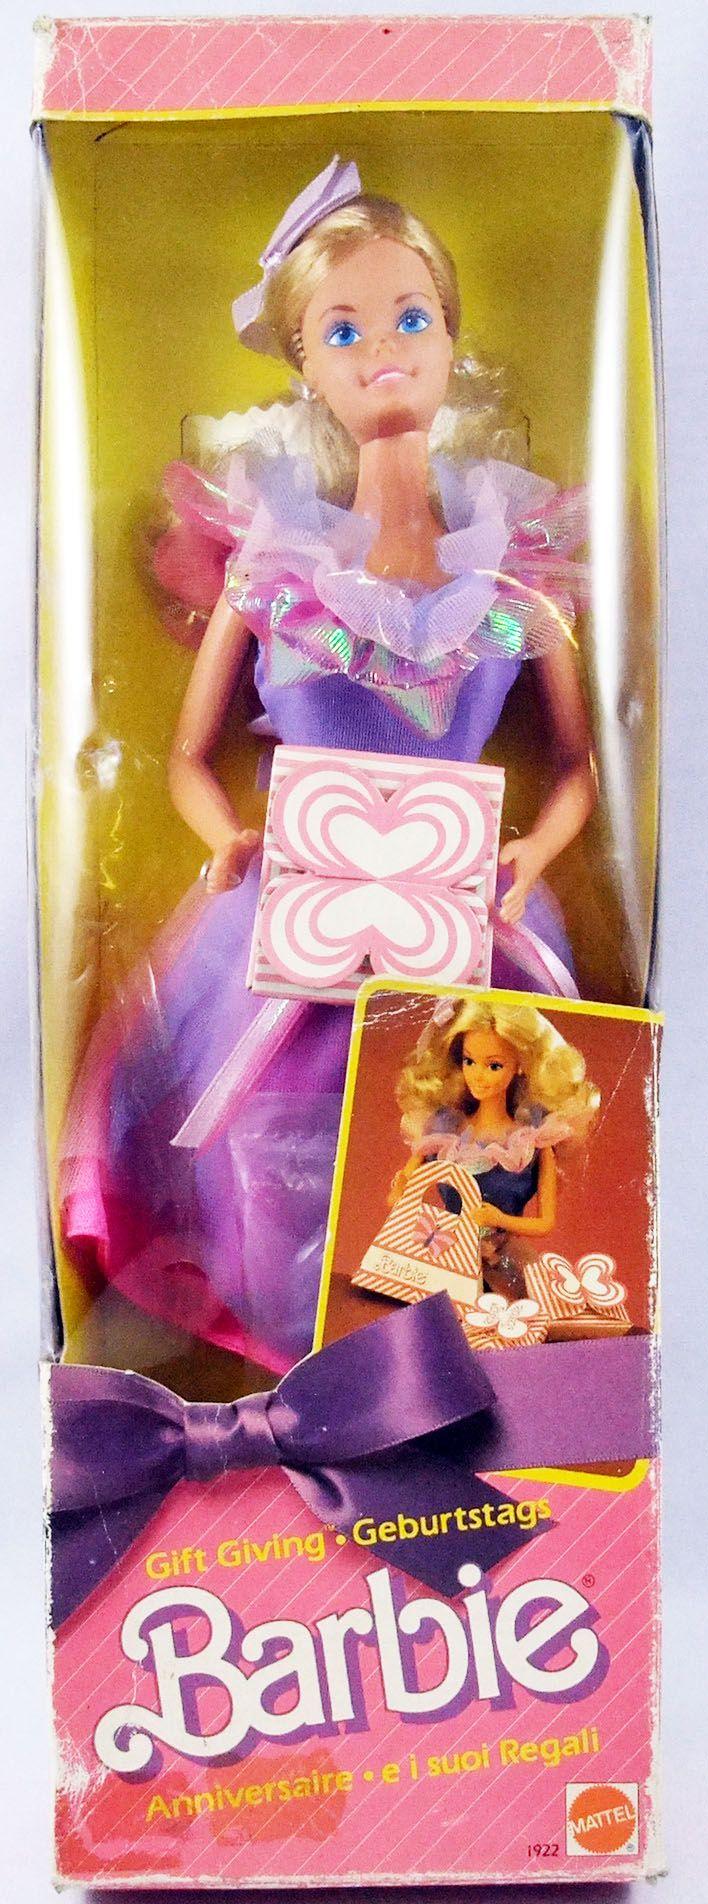 Barbie - Gift Giving Barbie Anniversaire - Mattel 1985 (ref.1922)